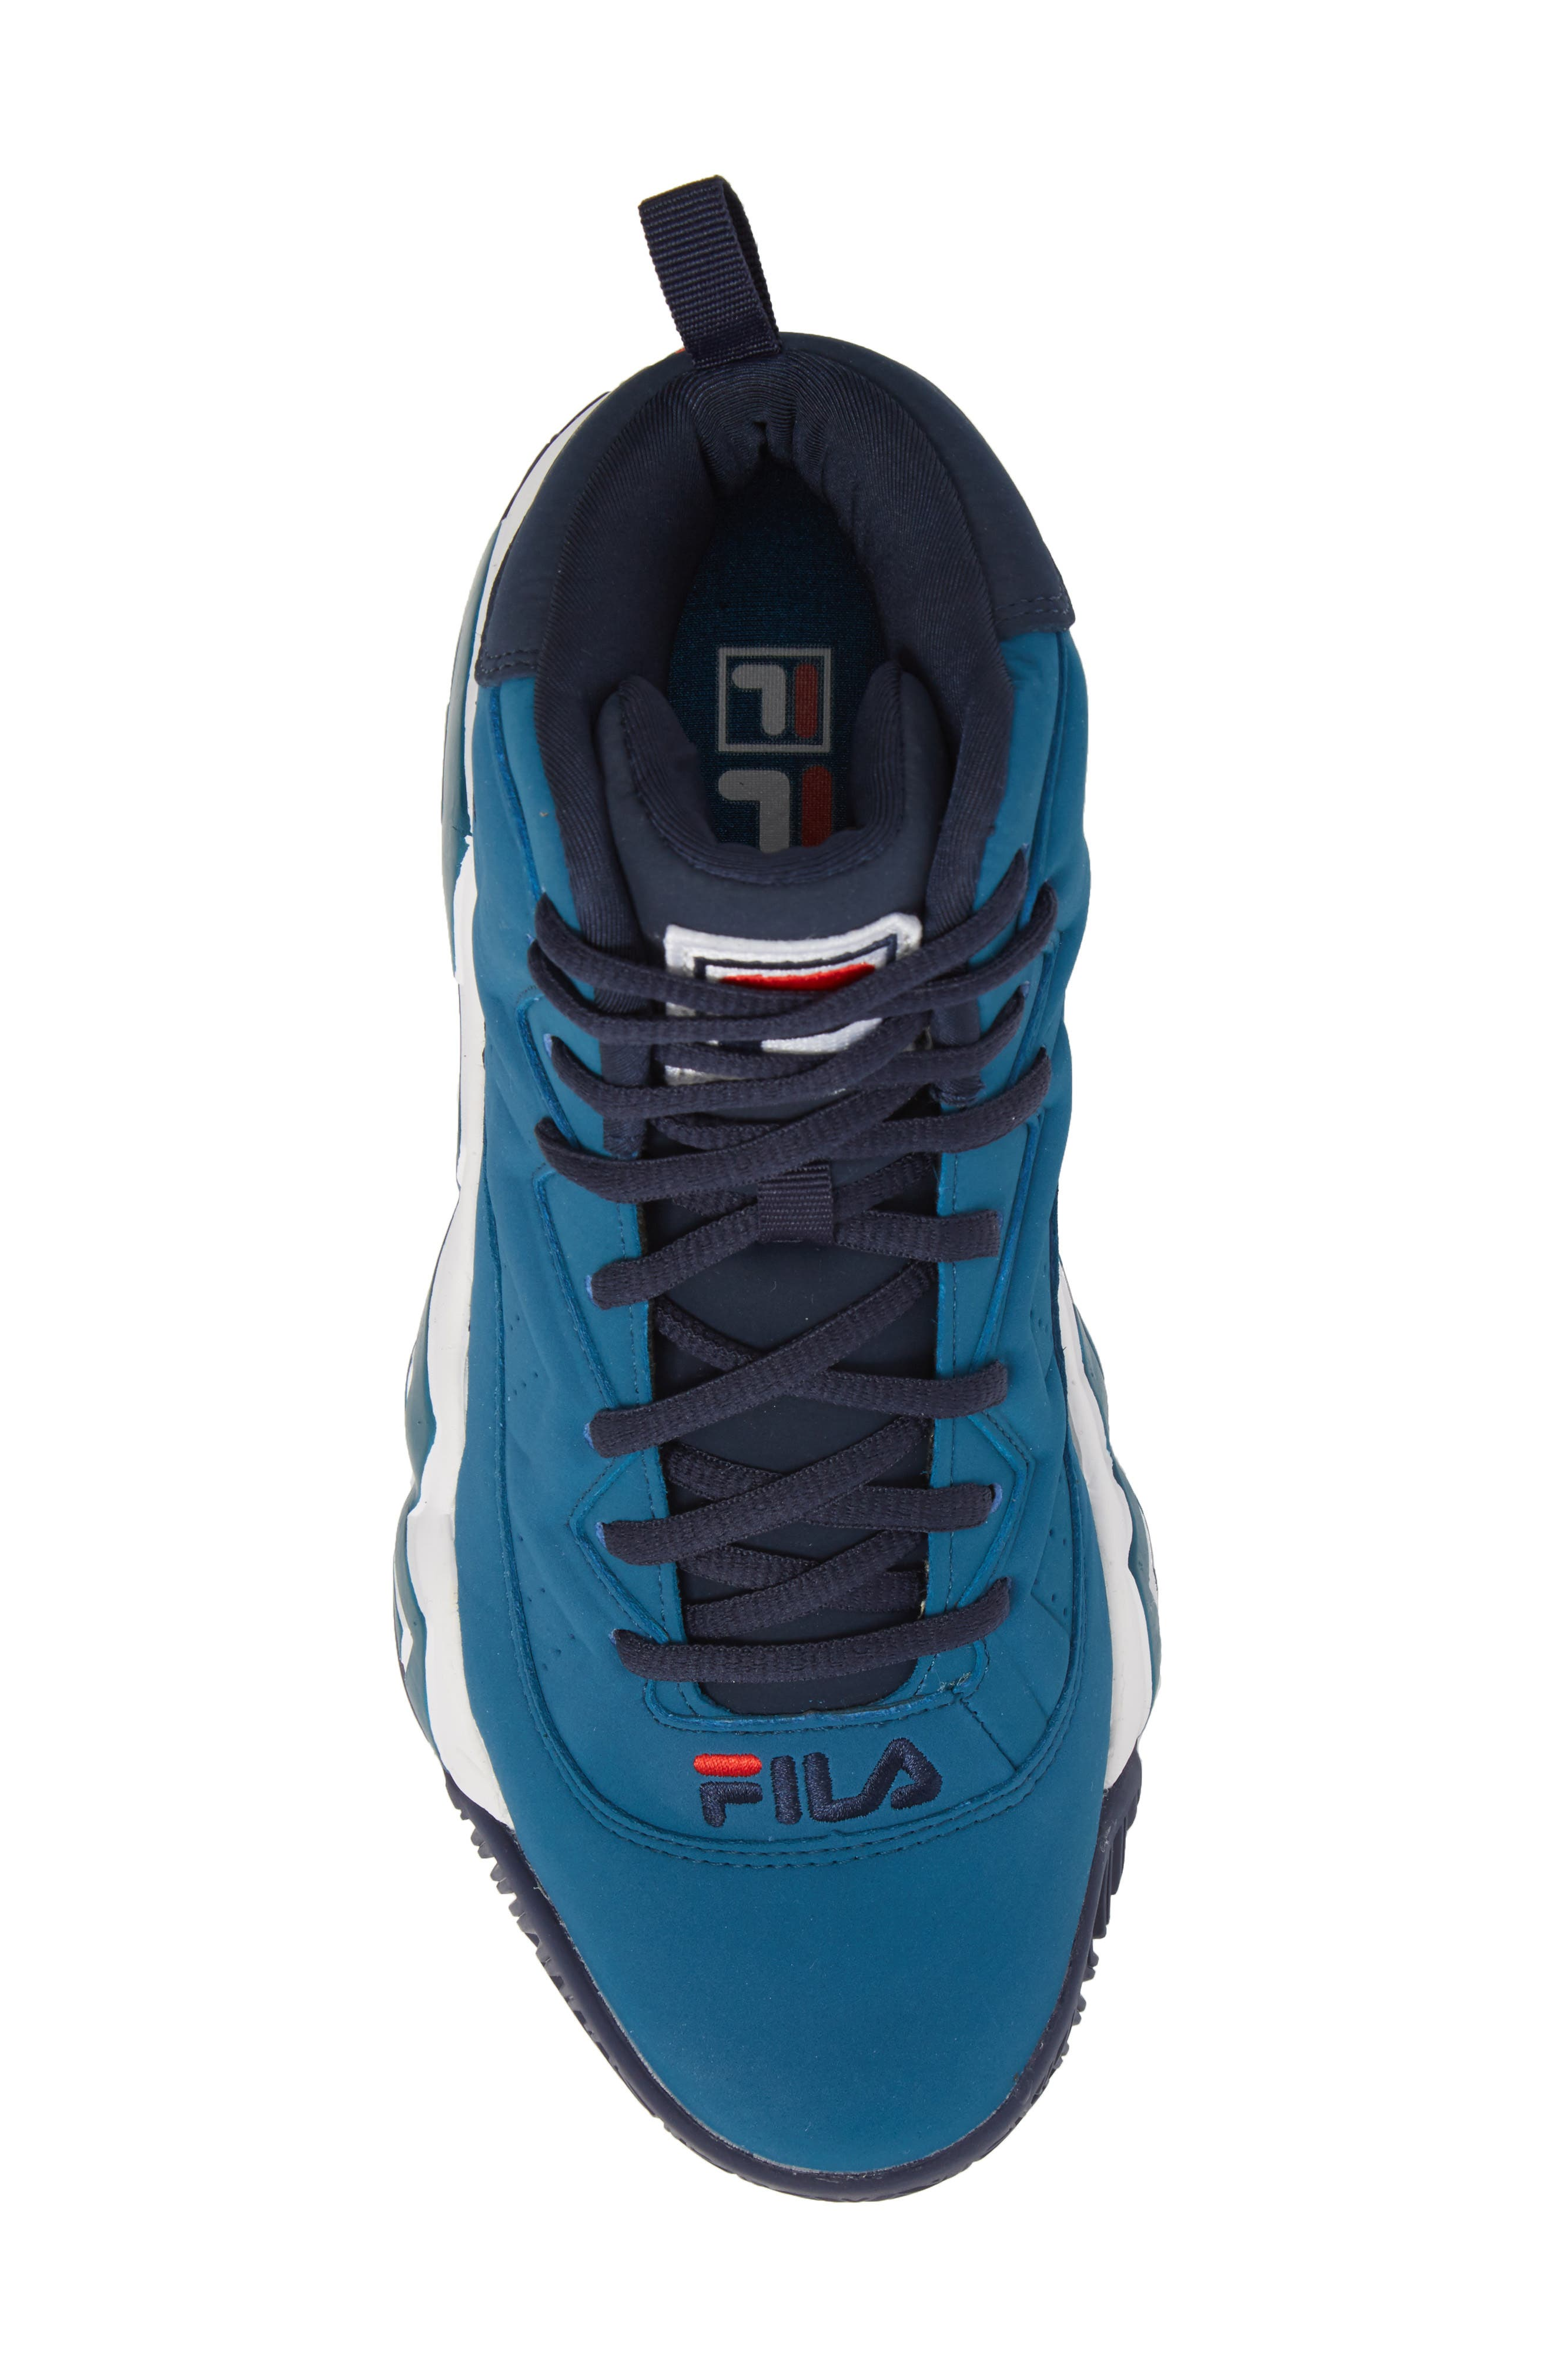 MB High Top Sneaker,                             Alternate thumbnail 5, color,                             INK BLUE/ FILA NAVY